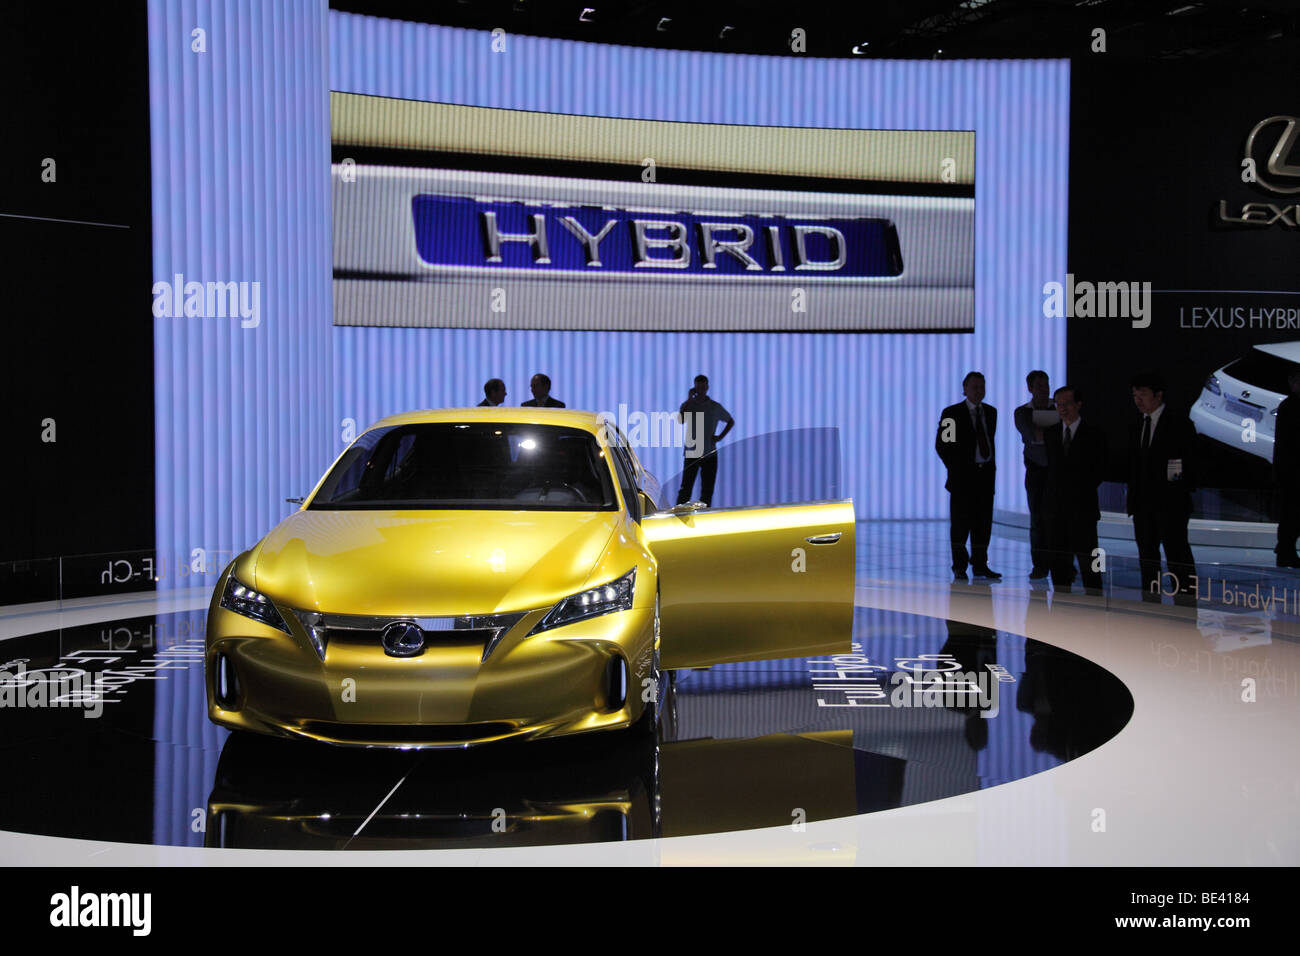 63th International Motor Show ( IAA ): Presentation of a Lexus passenger car with hybride drive - Stock Image